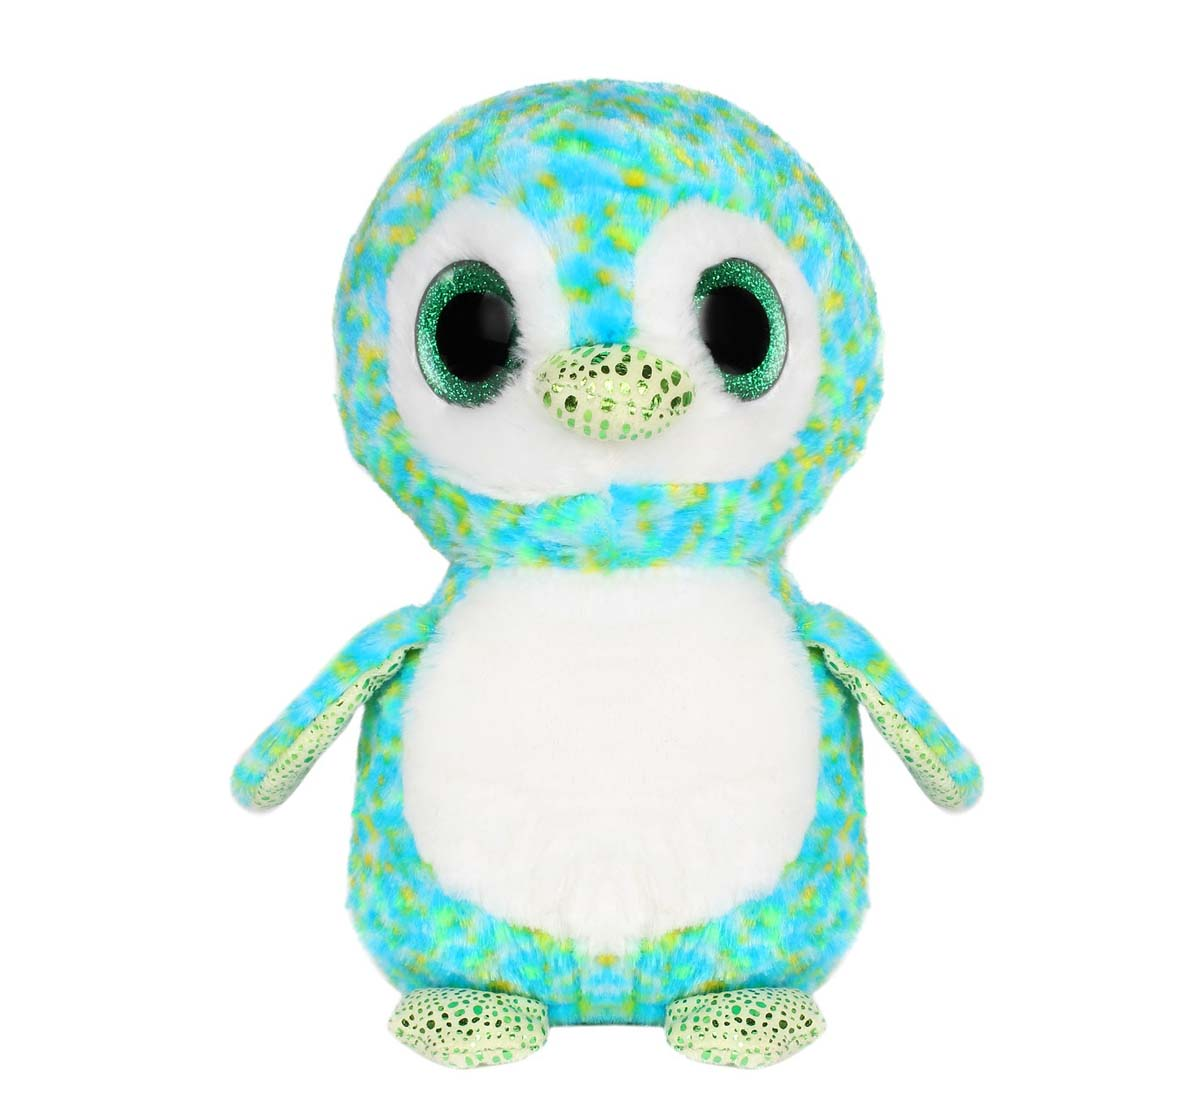 Qingdao | Qingdao Sitting Owl, 23Cm Quirky Soft Toys for Kids Age 0M+ - 23 Cm (Green)